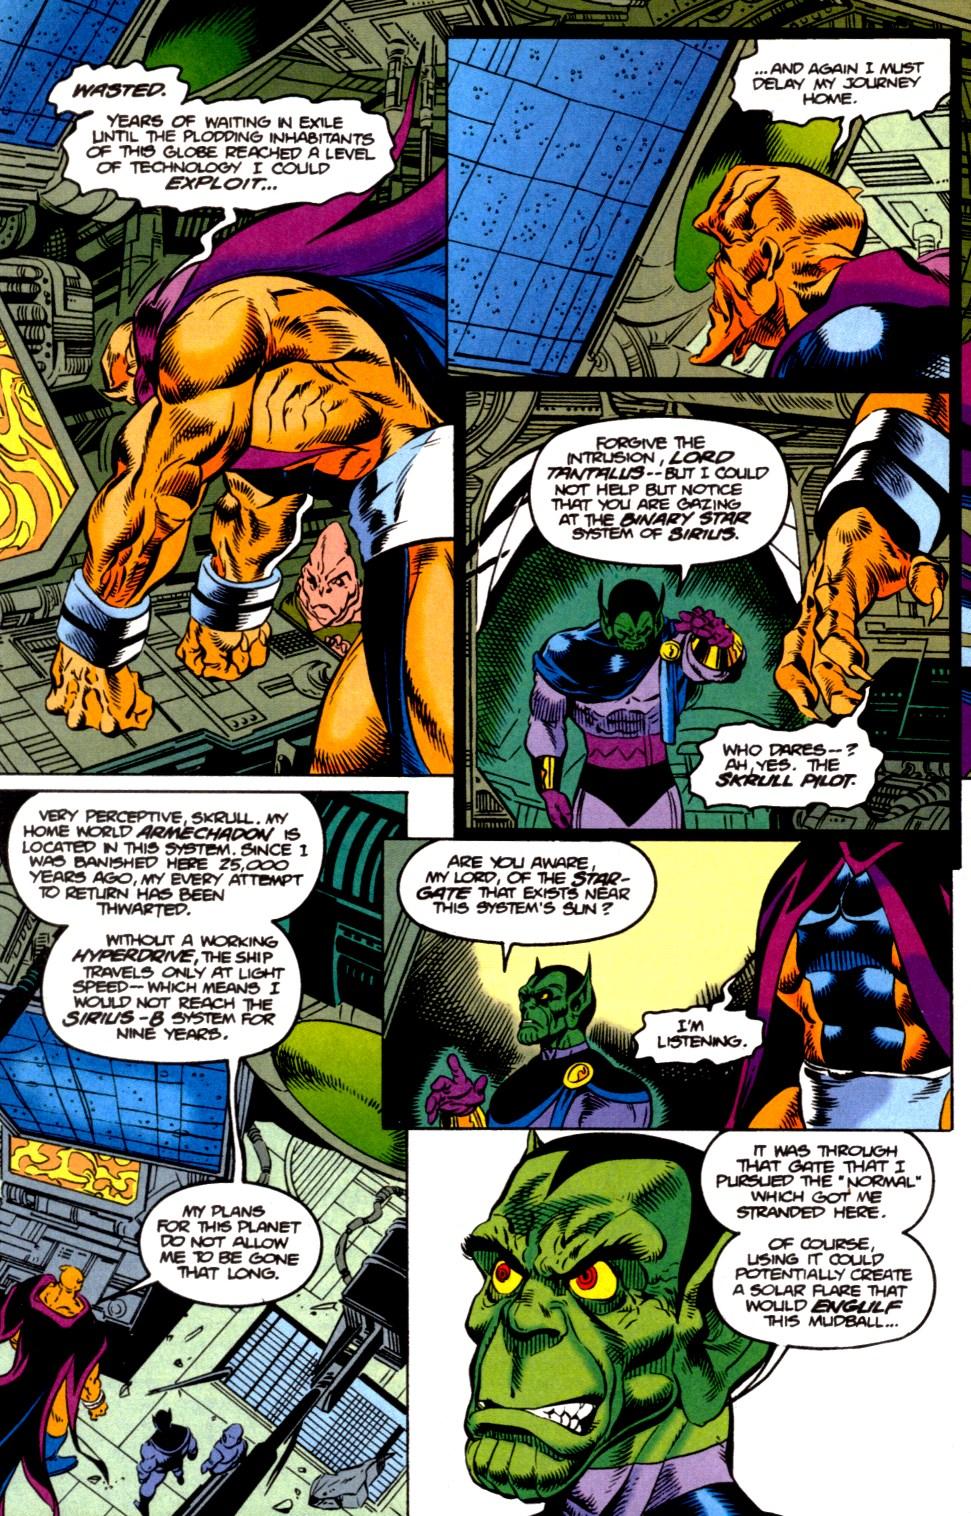 Read online Blackwulf comic -  Issue #6 - 12